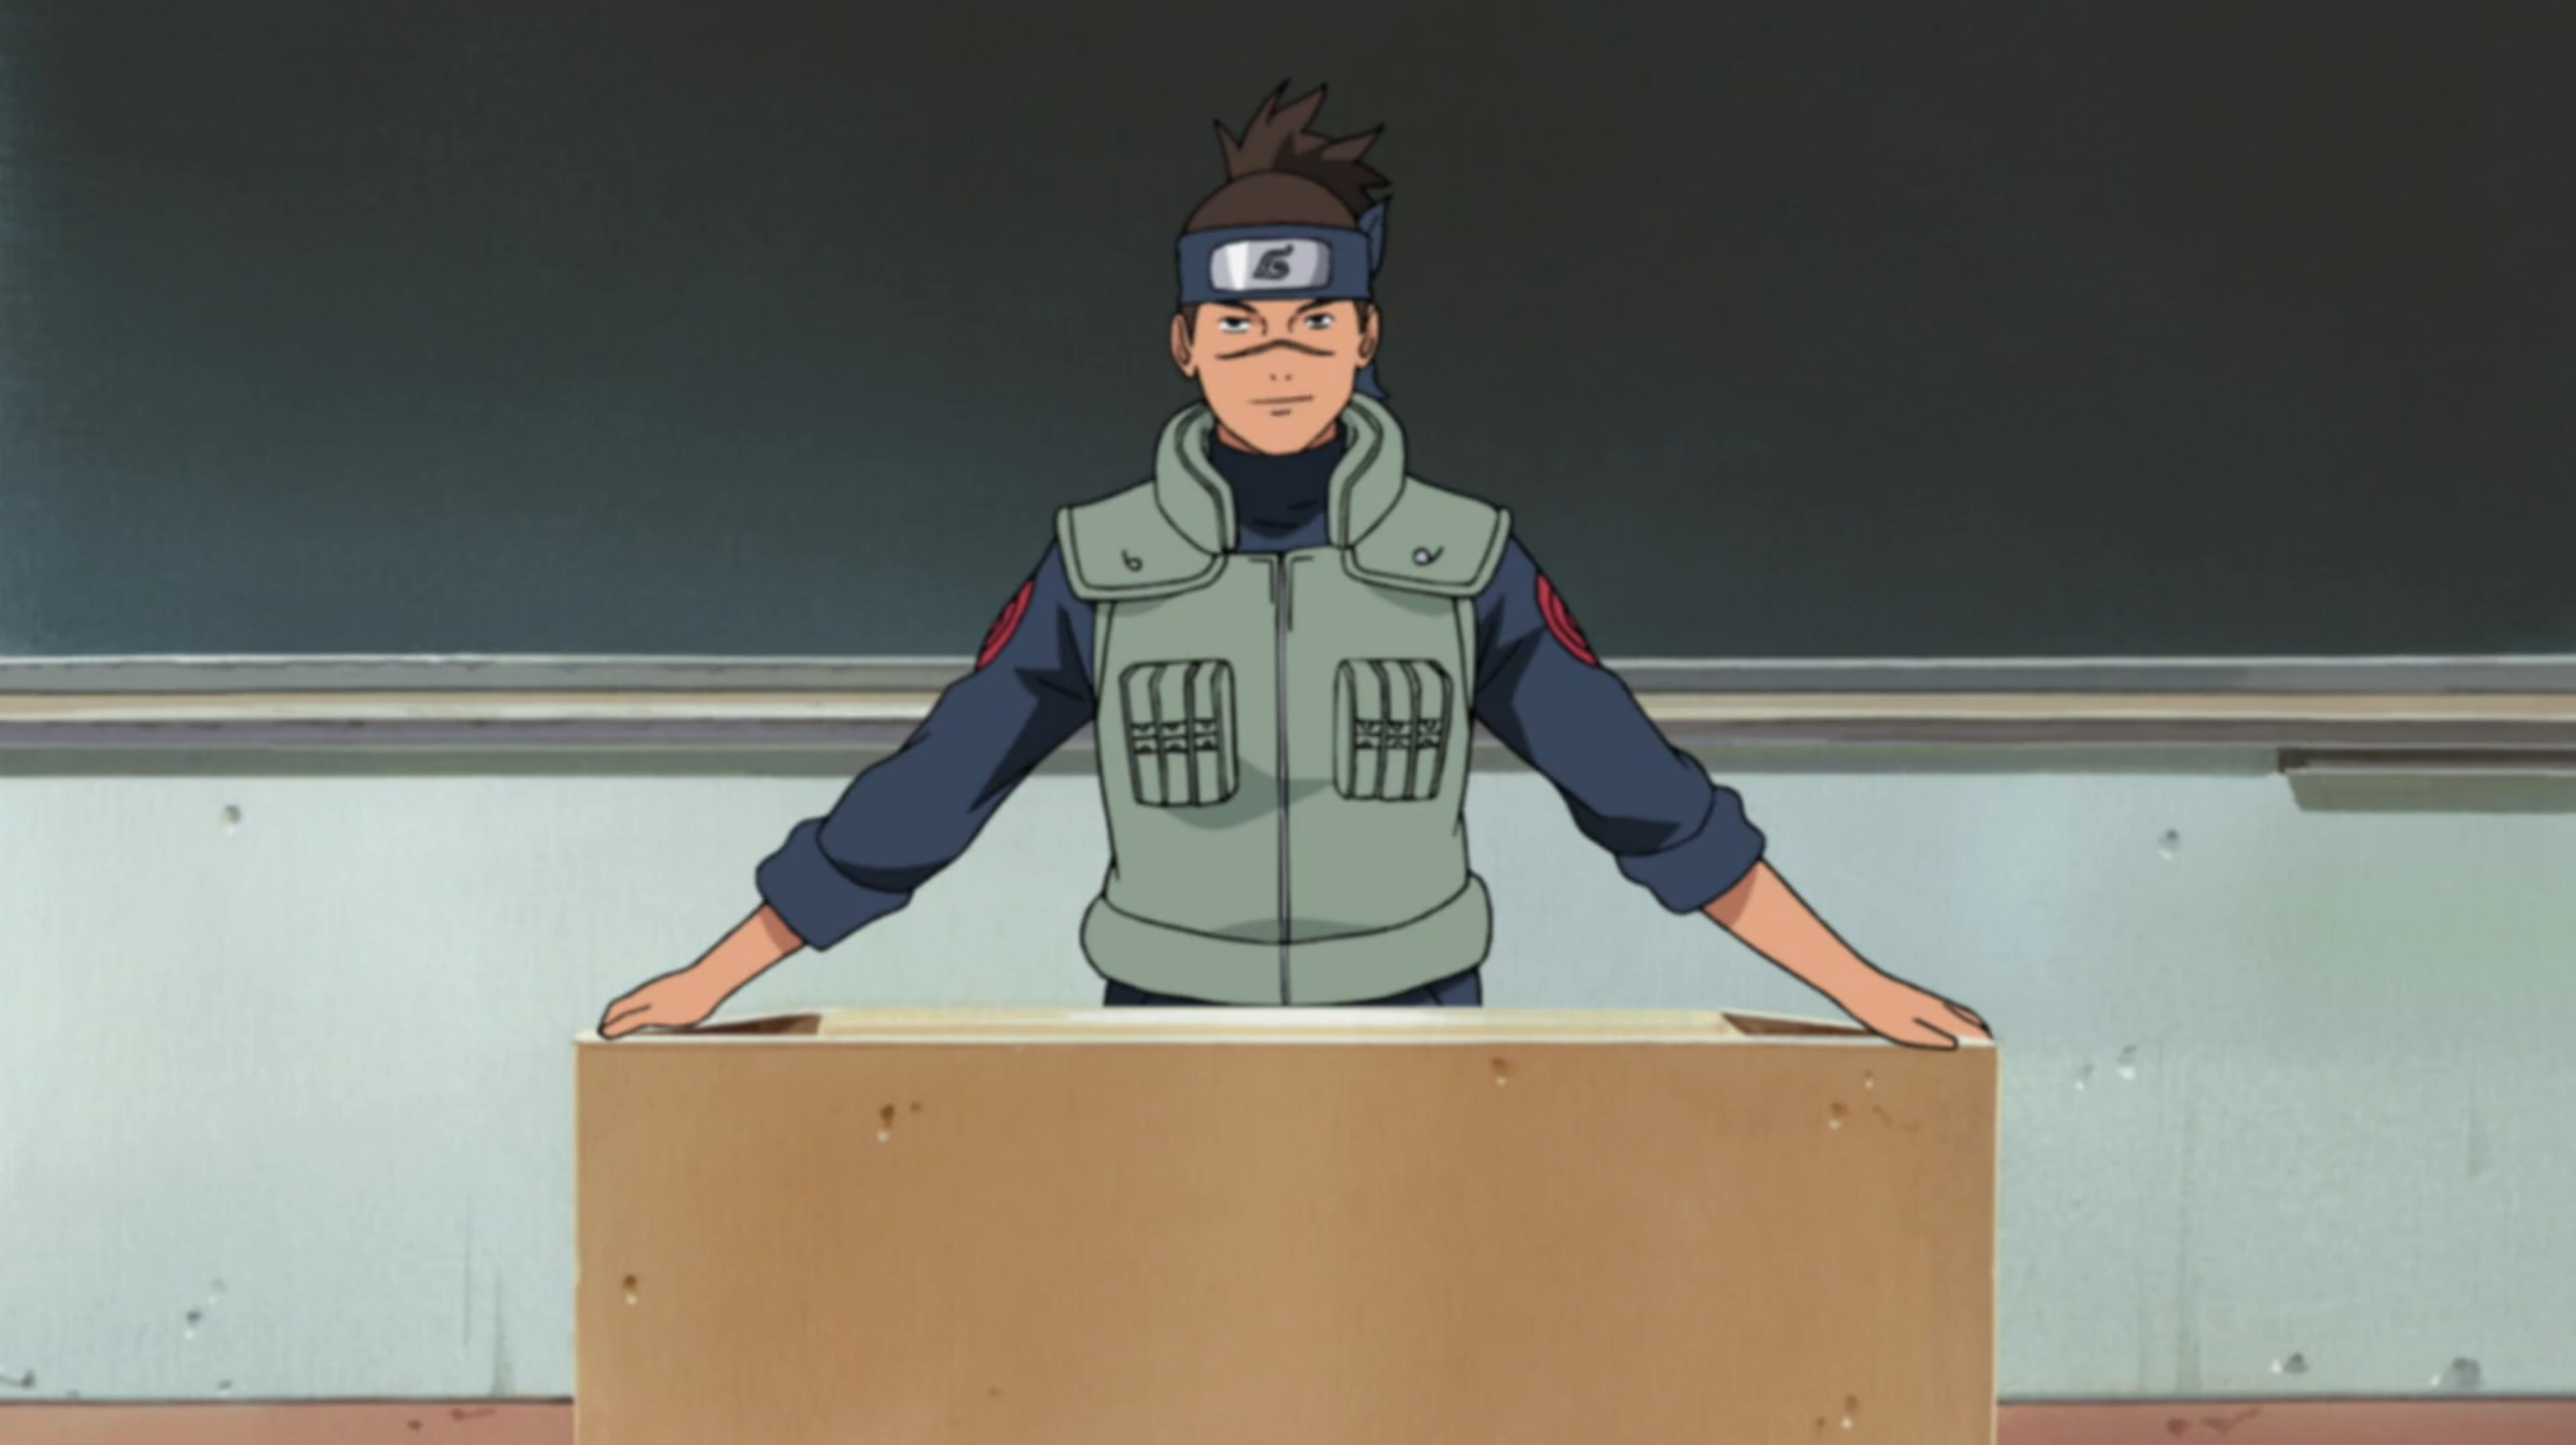 Chapitre de Konoha : Iruka, professeur novice